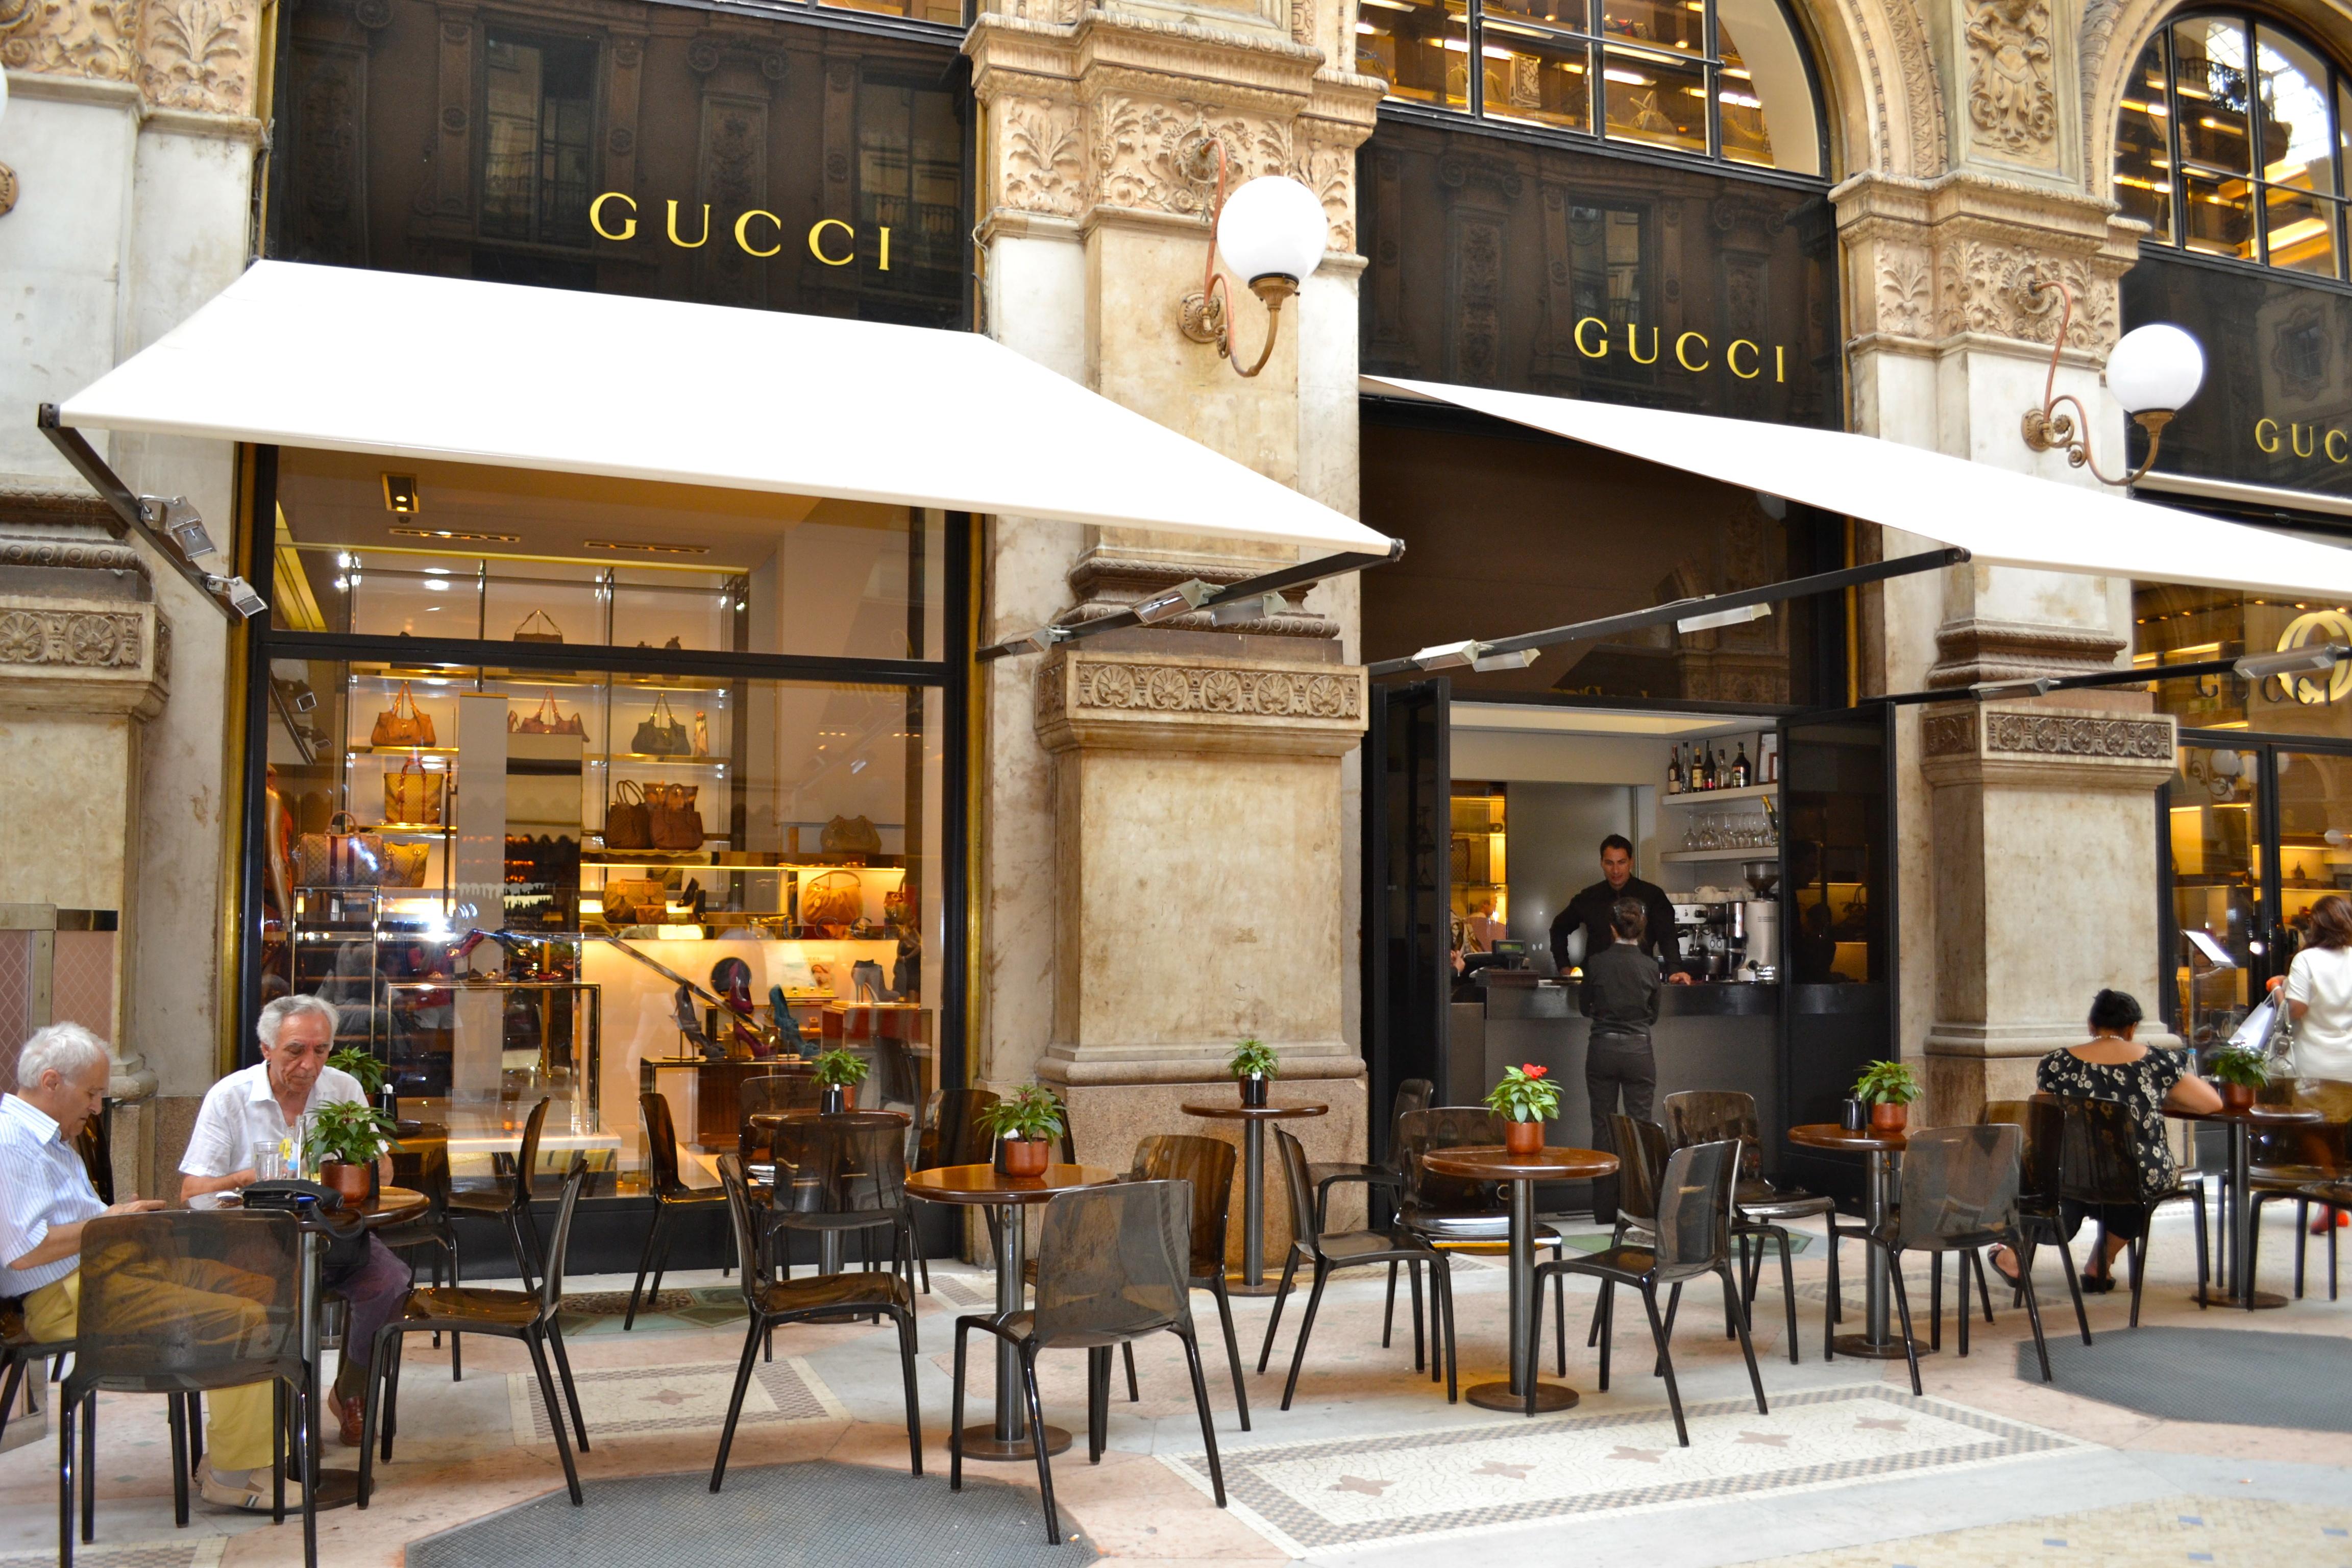 La Galleria Vittorio Emanuele Ii My Milan Guide